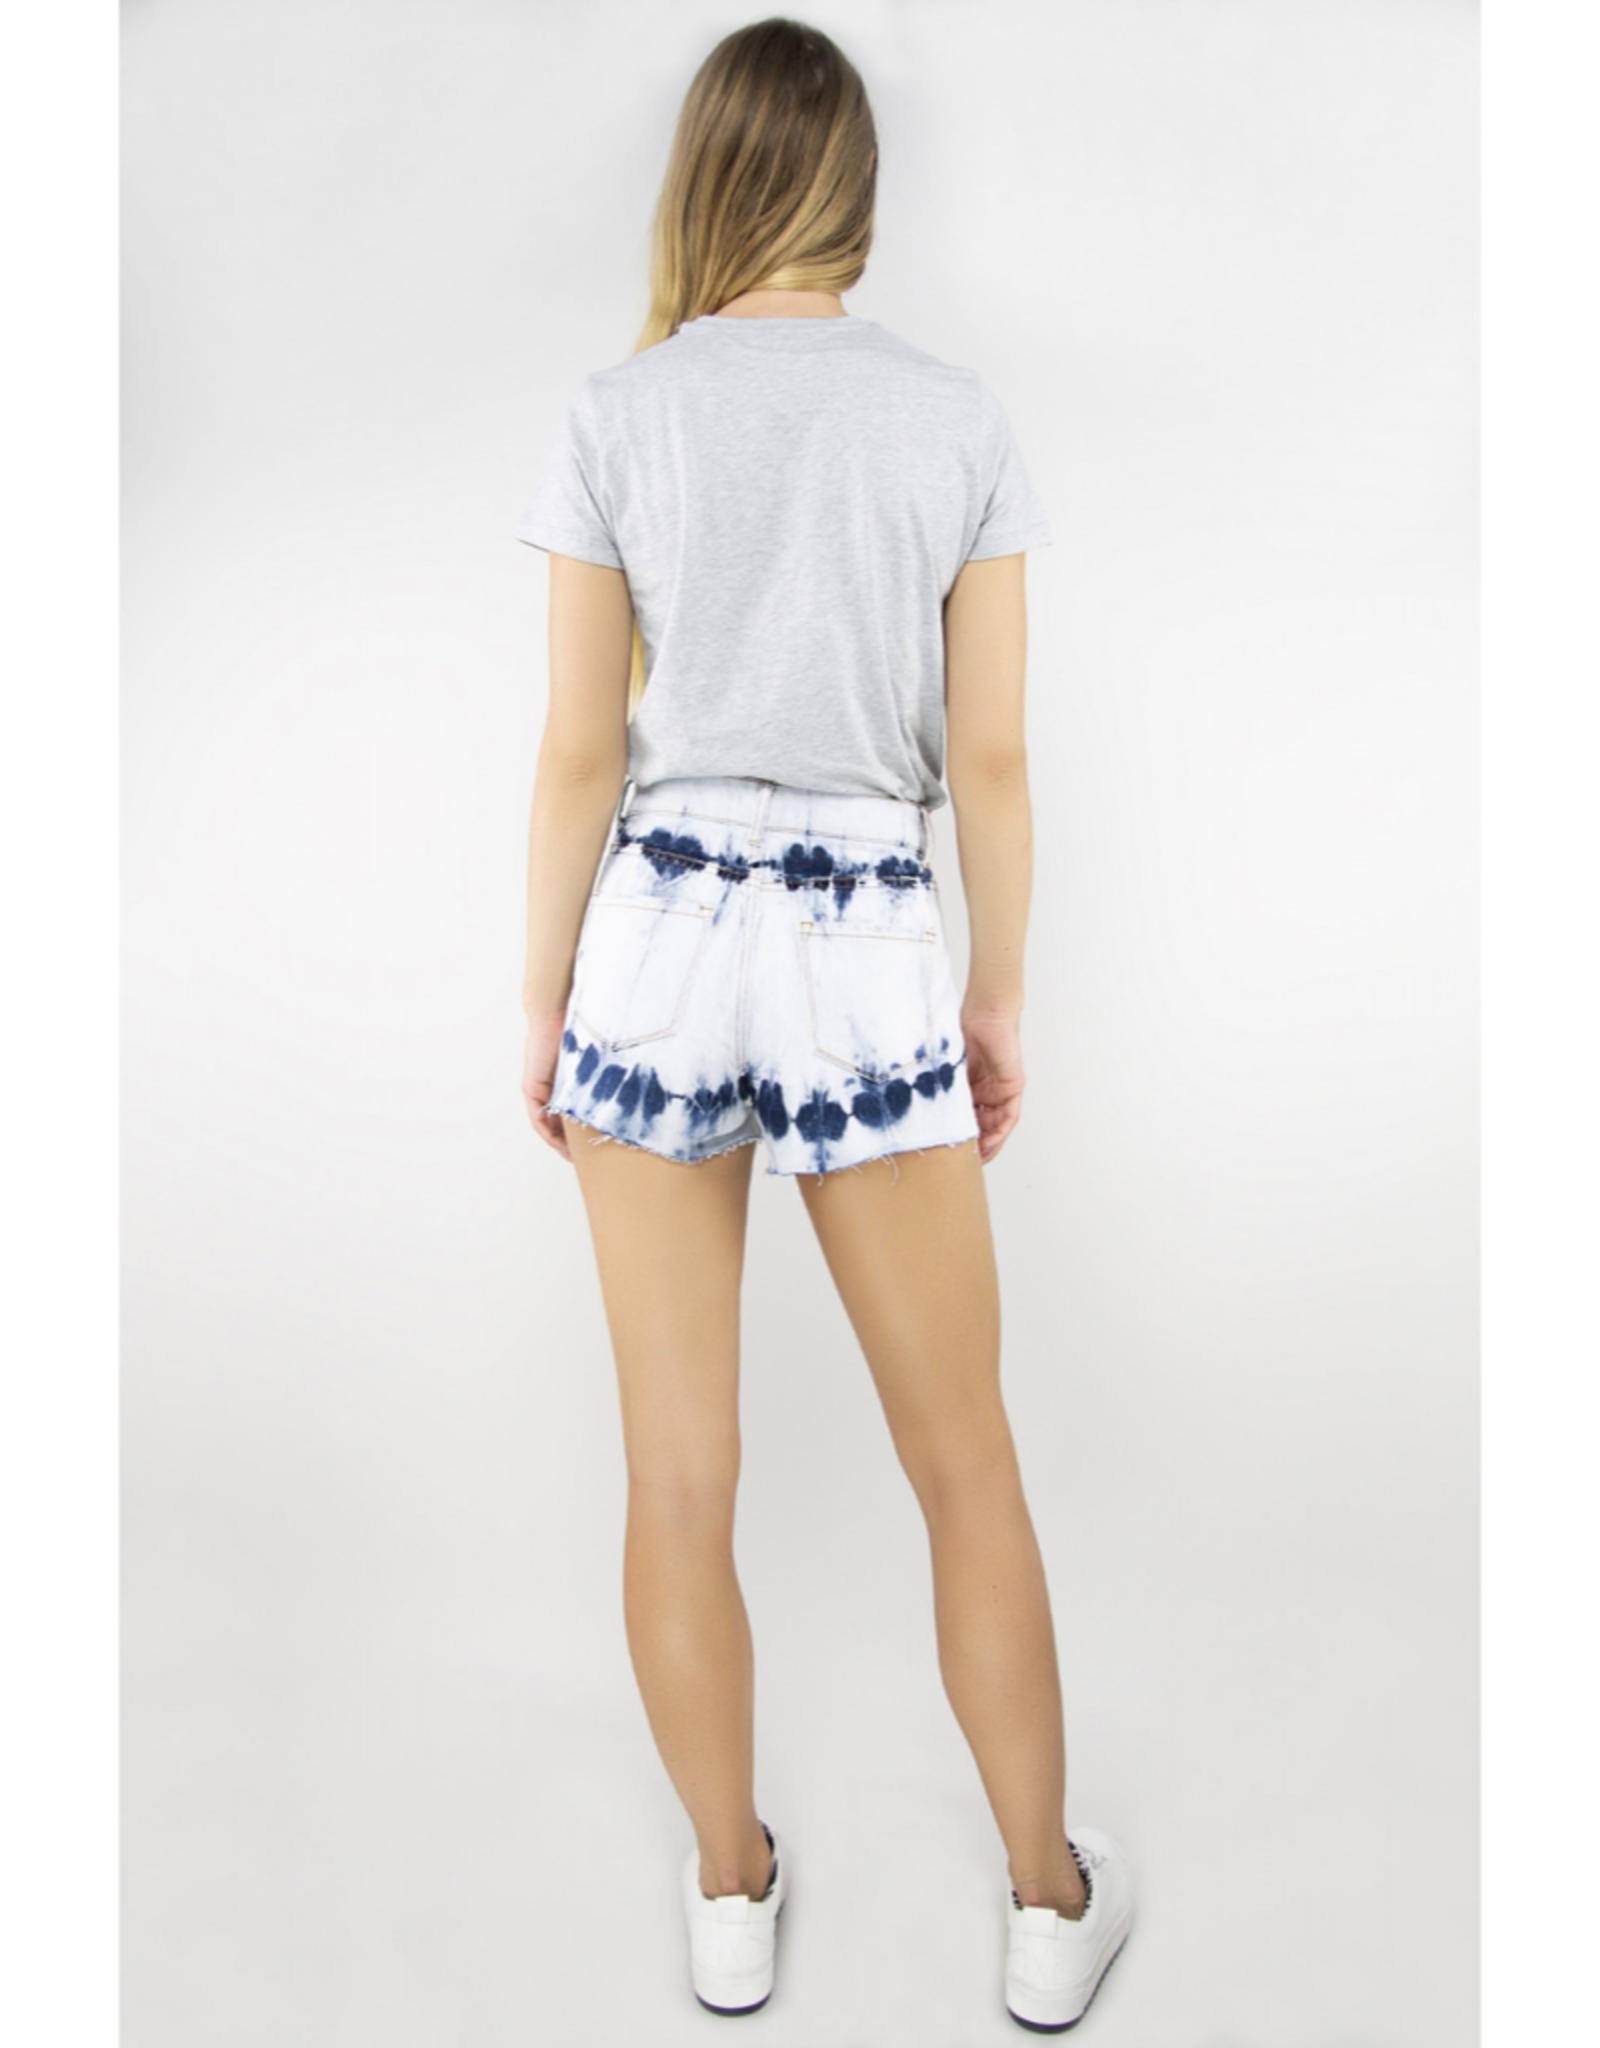 Distressed Tie Dye Shorts with Frayed Hem